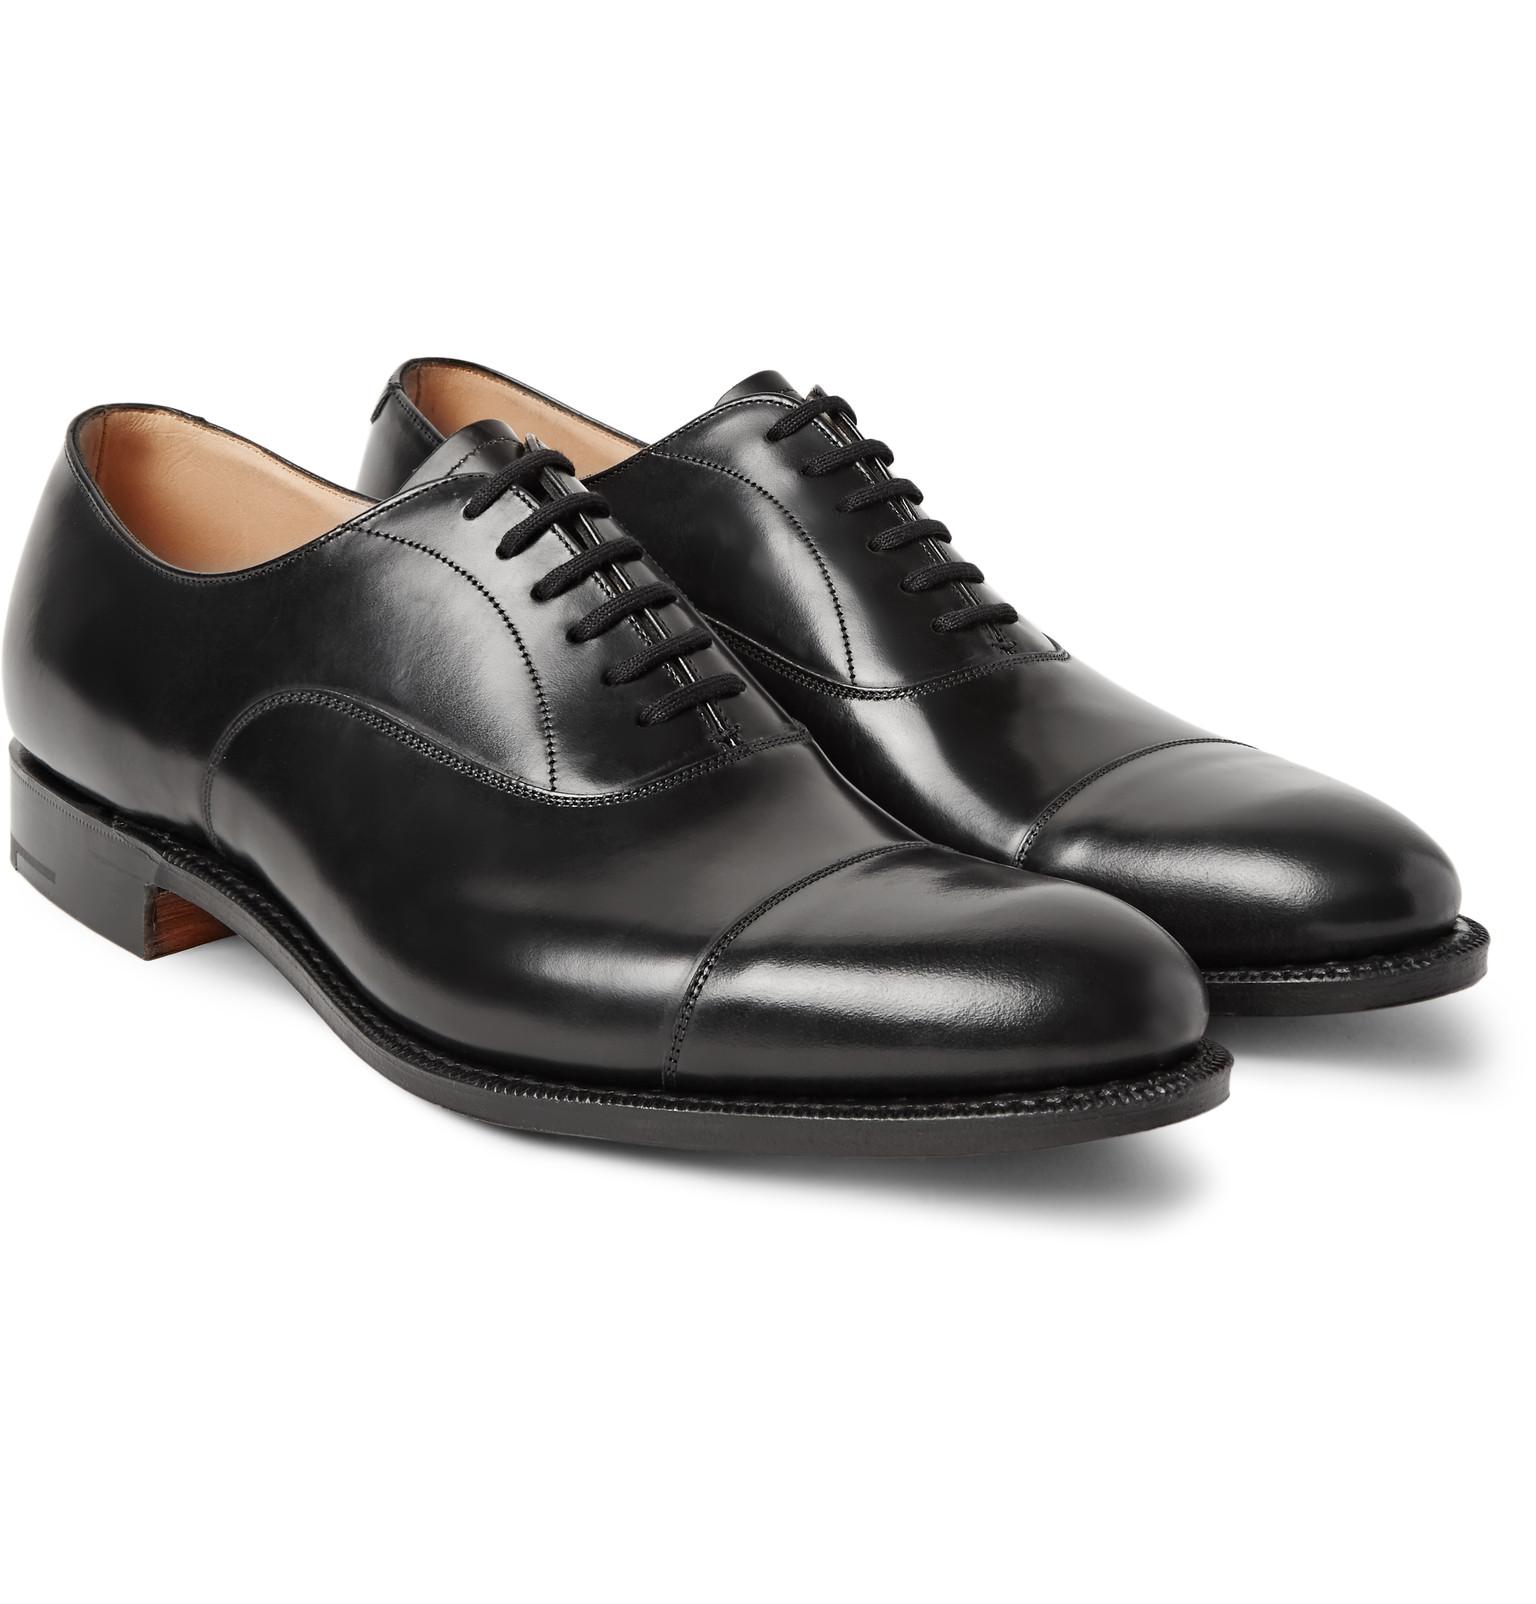 church shoes churchu0027sdubai polished-leather oxford shoes TWKOCMG